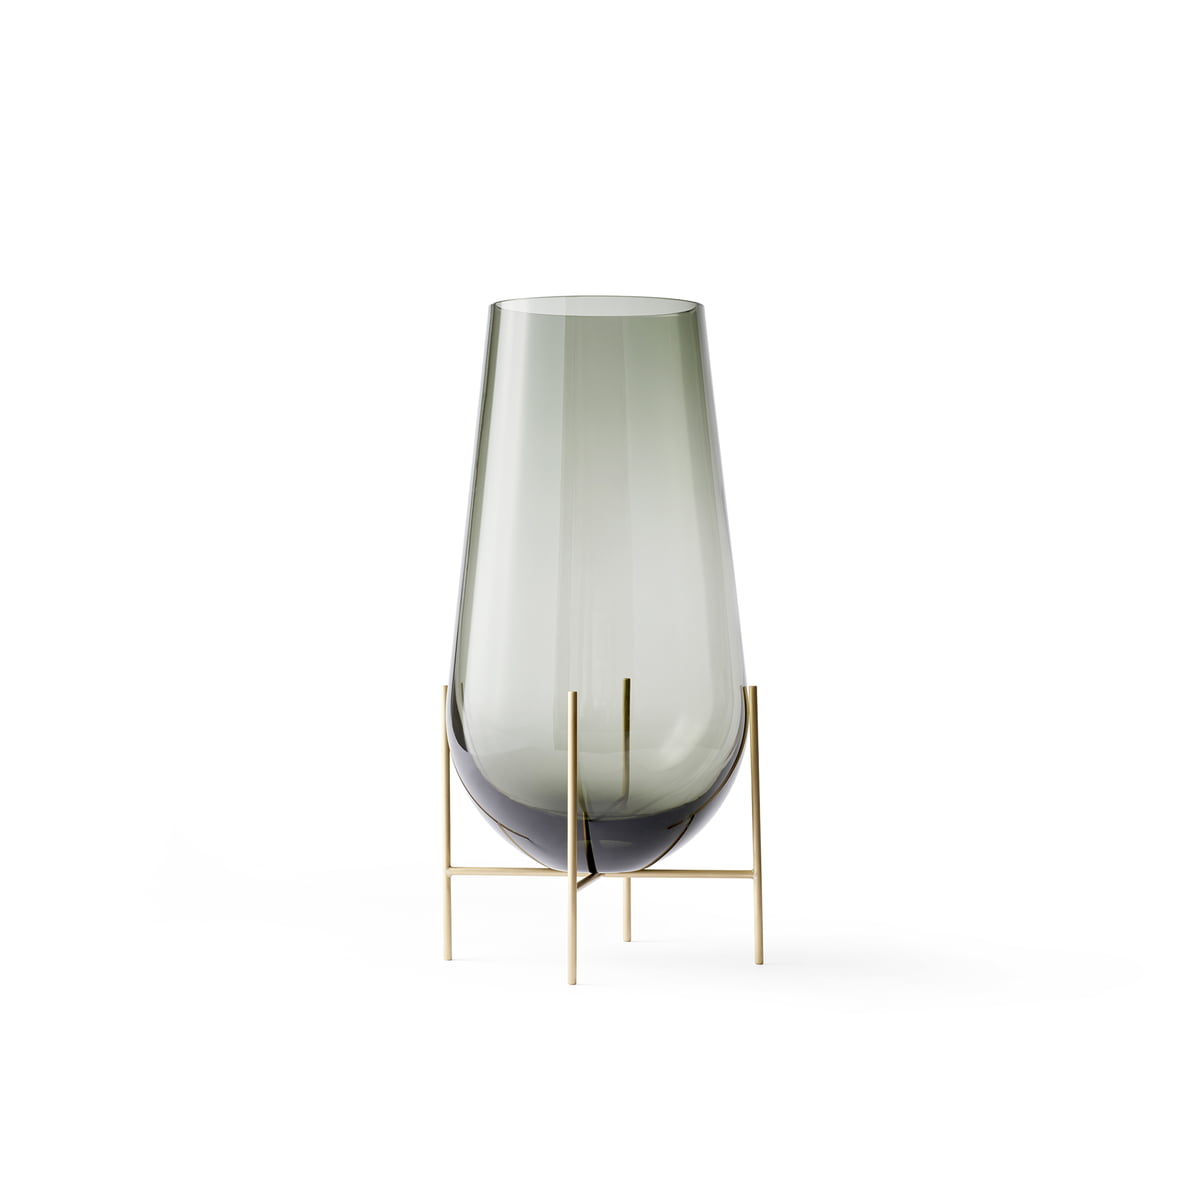 Menu - Échasse Vase S, smoke | Dekoration > Vasen | Menu